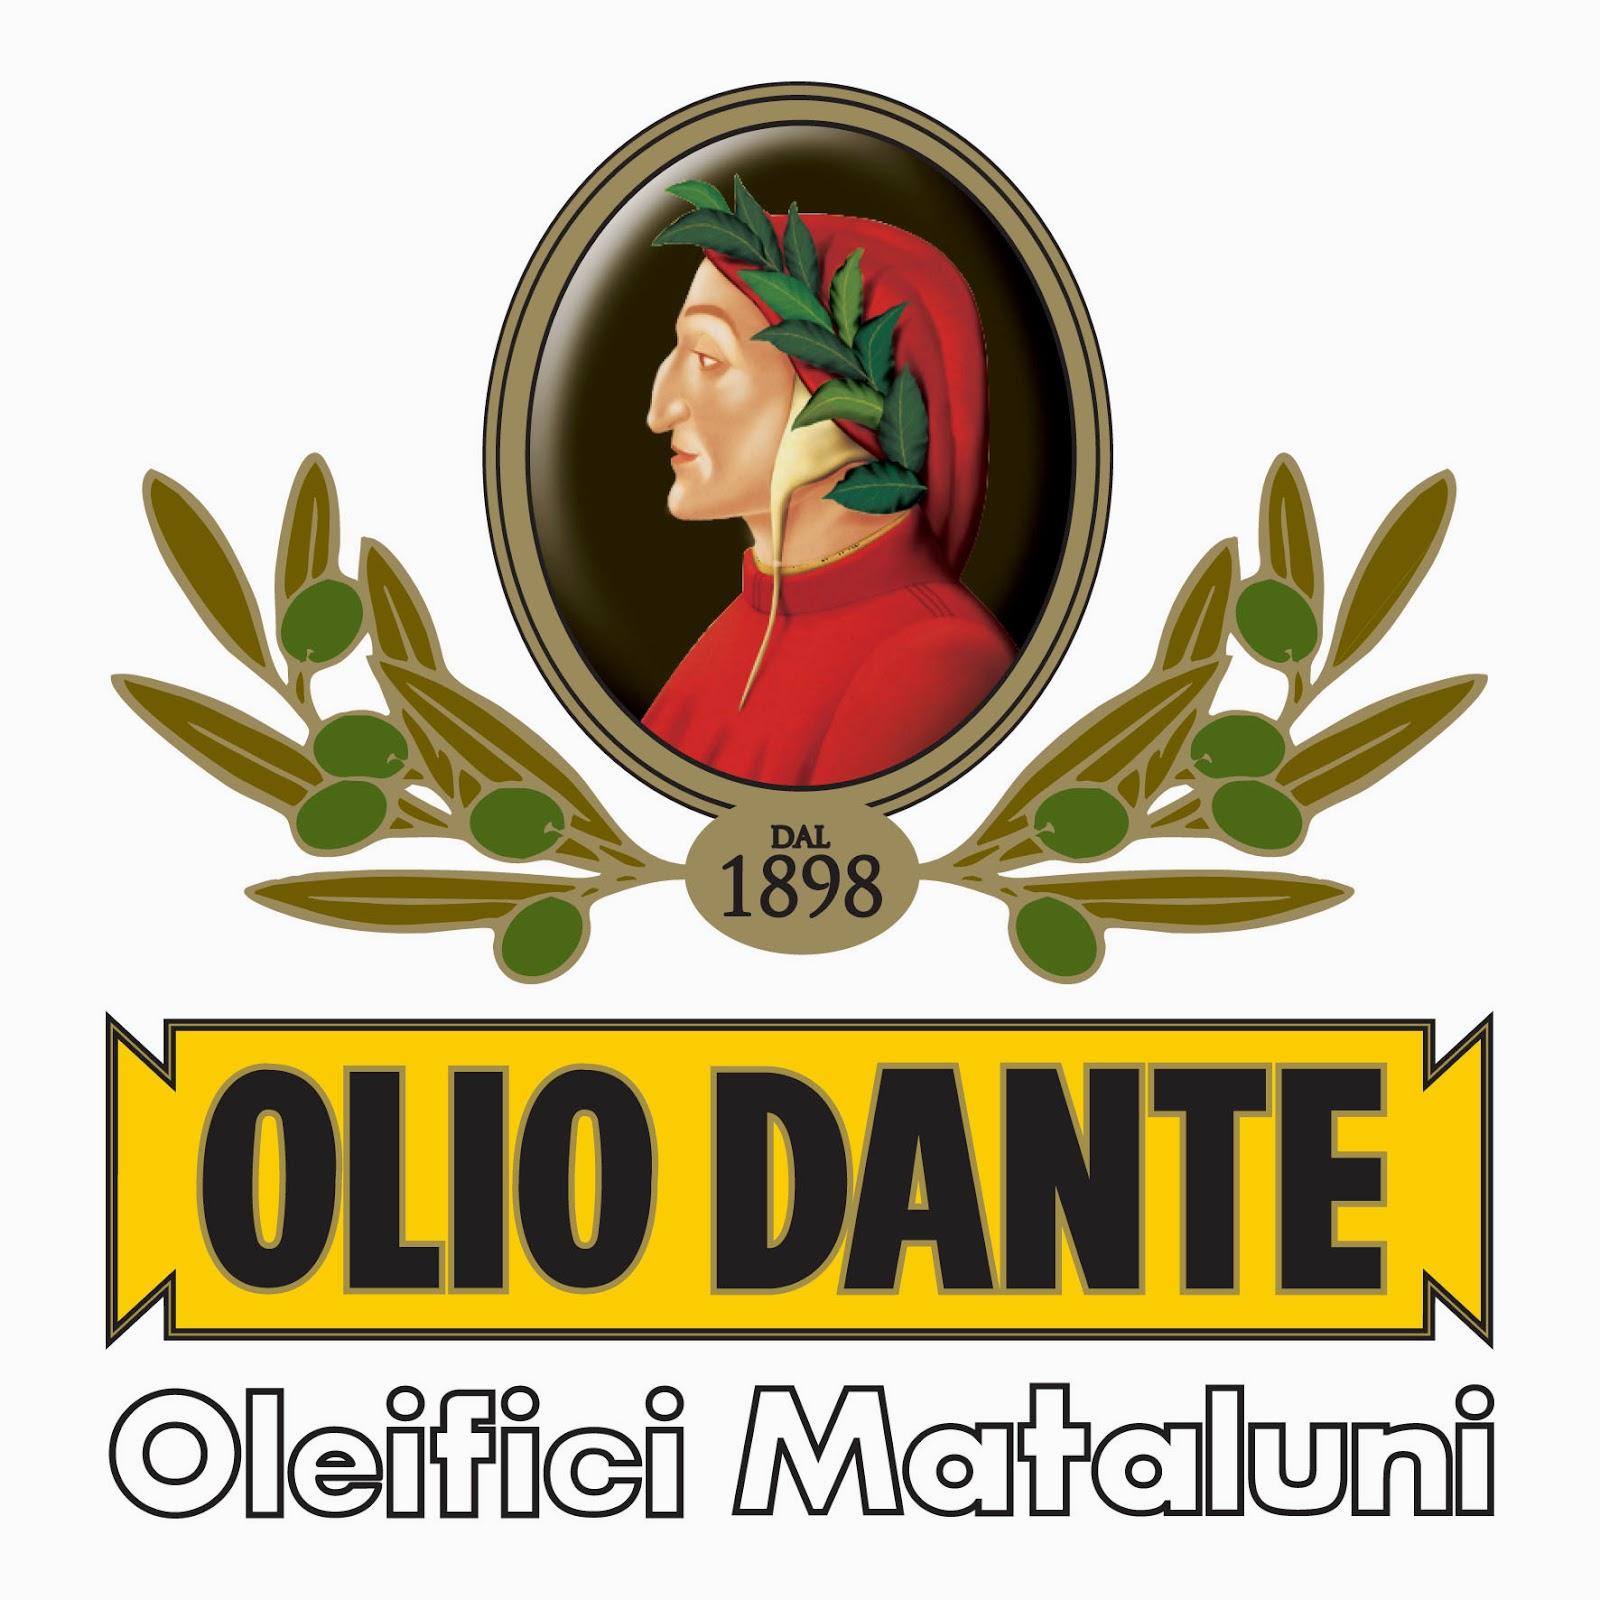 http://www.oleificimataluni.com/oliodante/